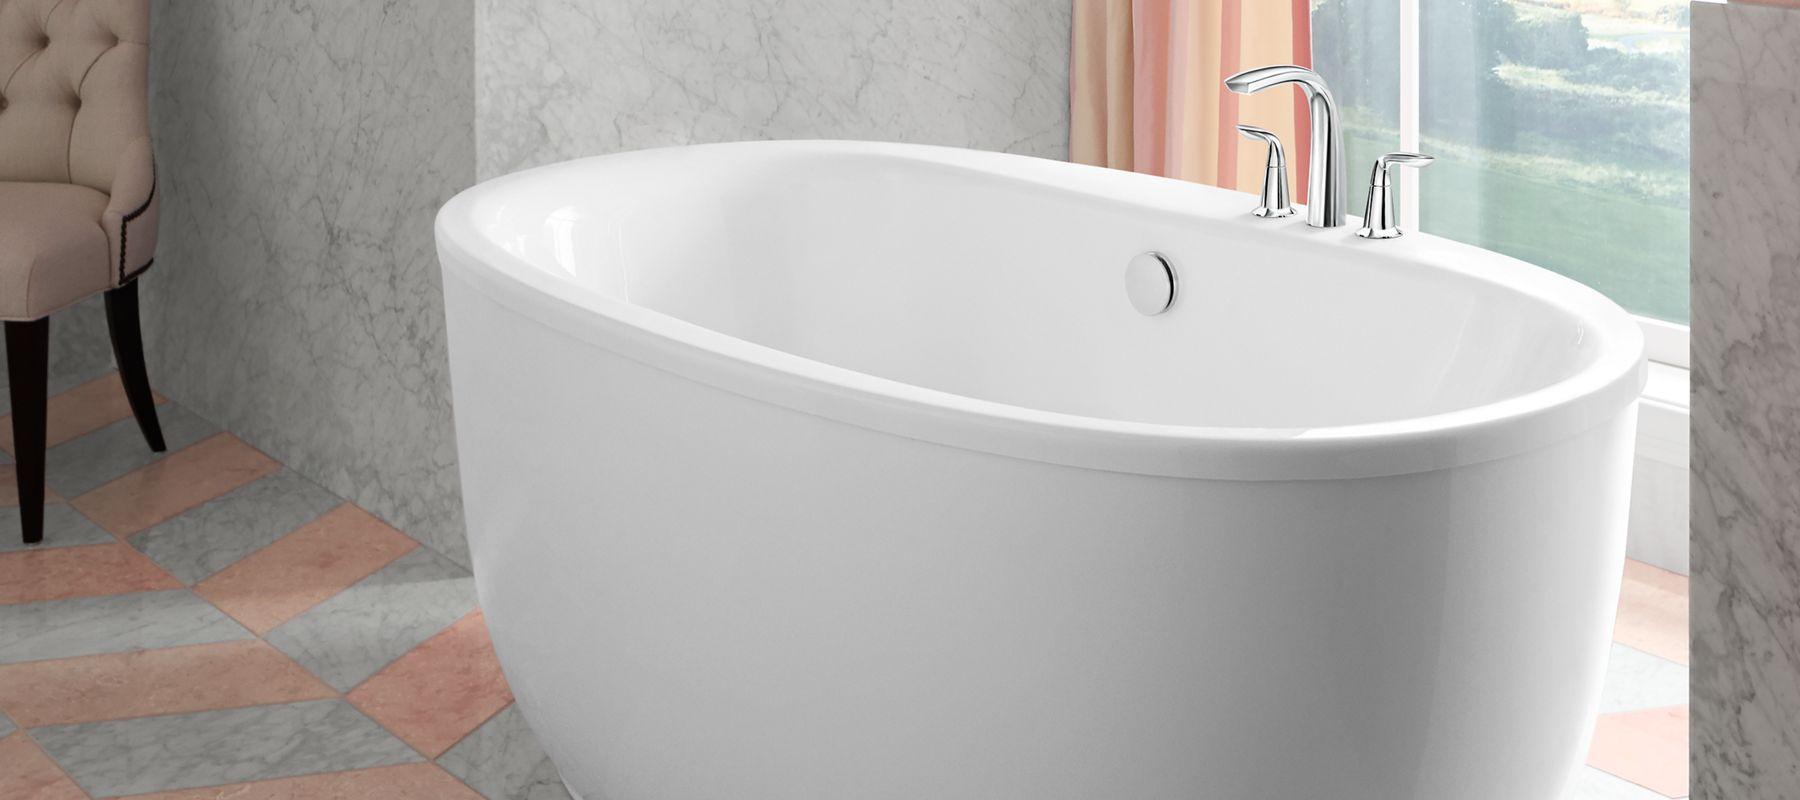 Acrylic Baths Amp Whirlpools Bathroom Kohler